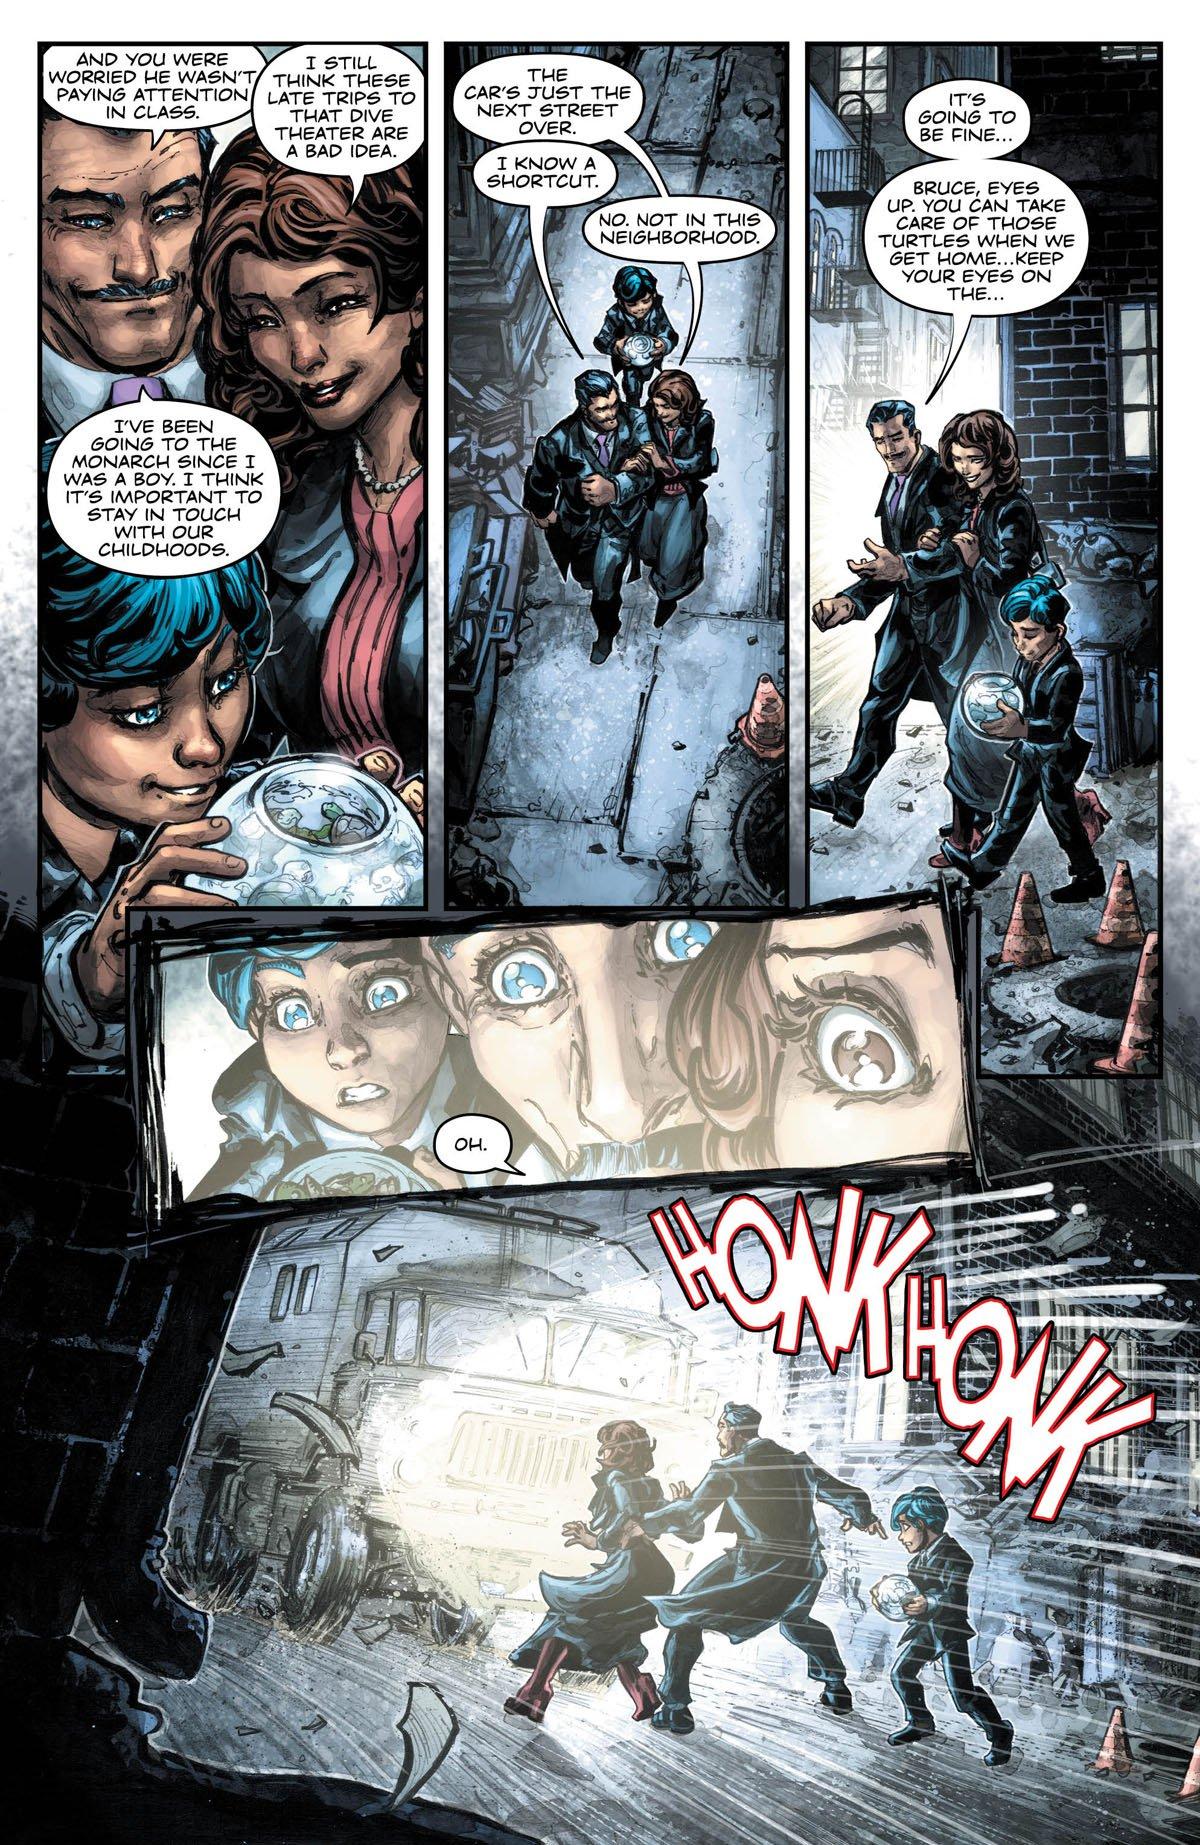 batman-tmnt-iii-issue-3-page-3.jpg